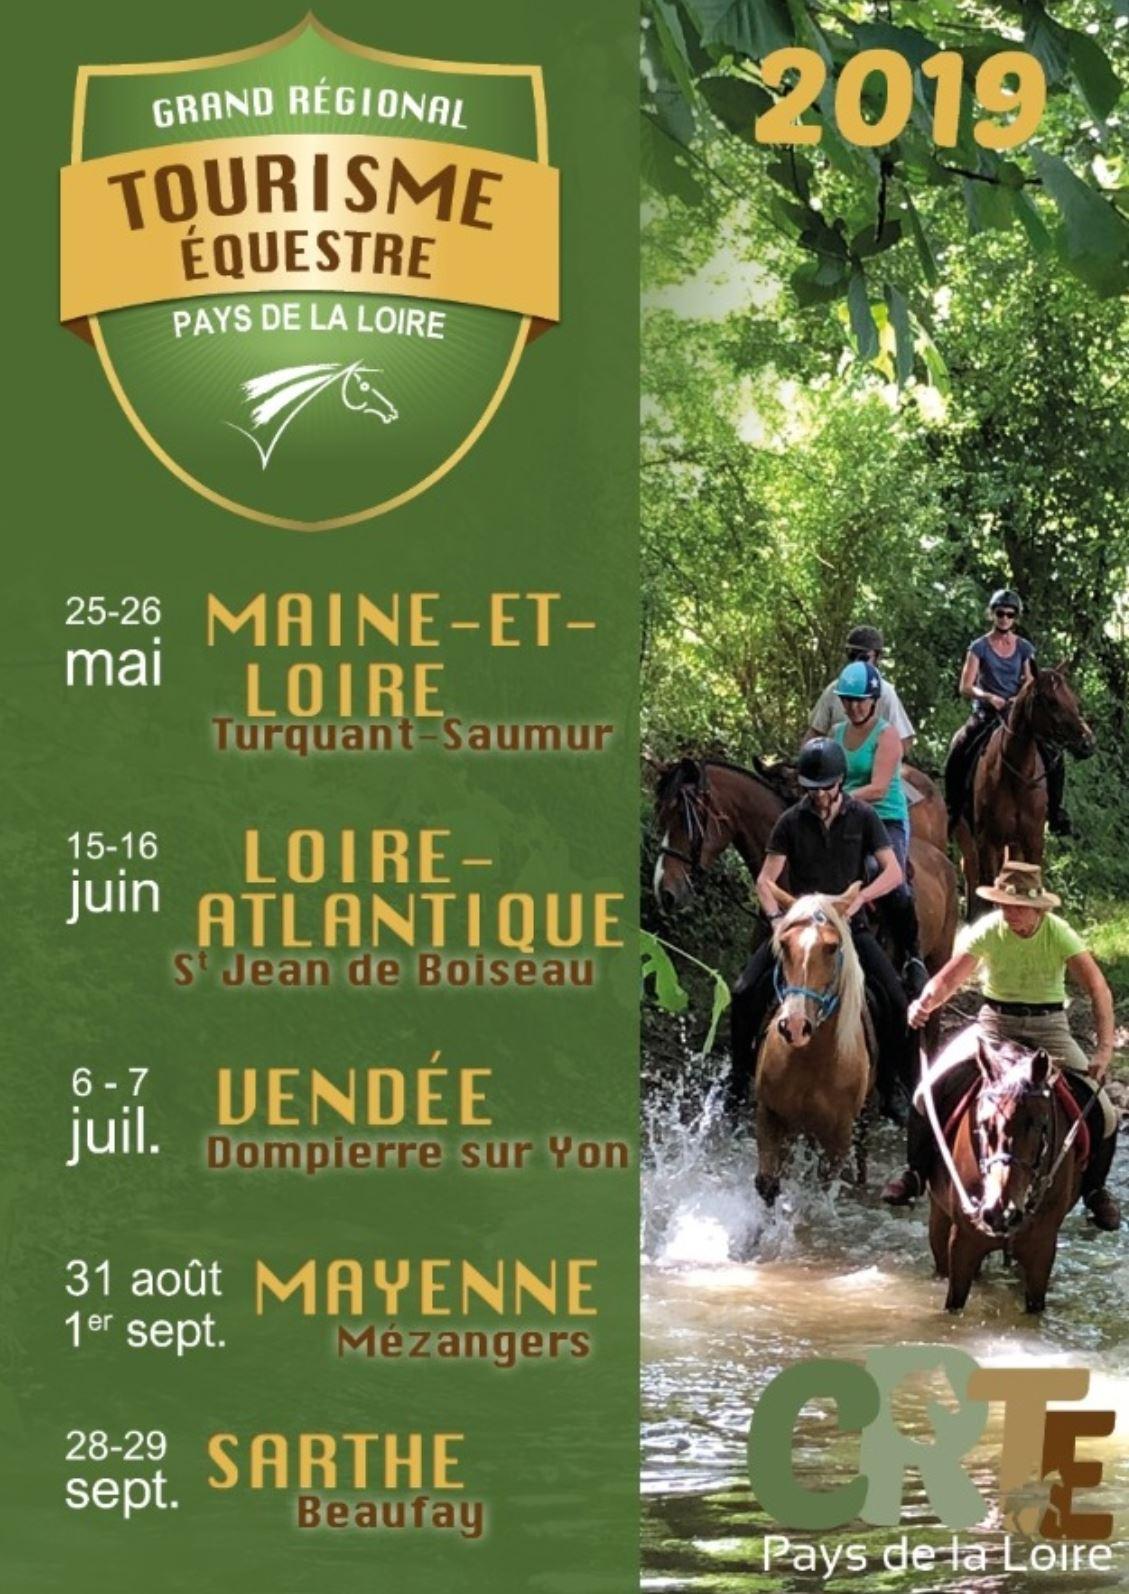 Participez au Grand Régional de Tourisme Equestre